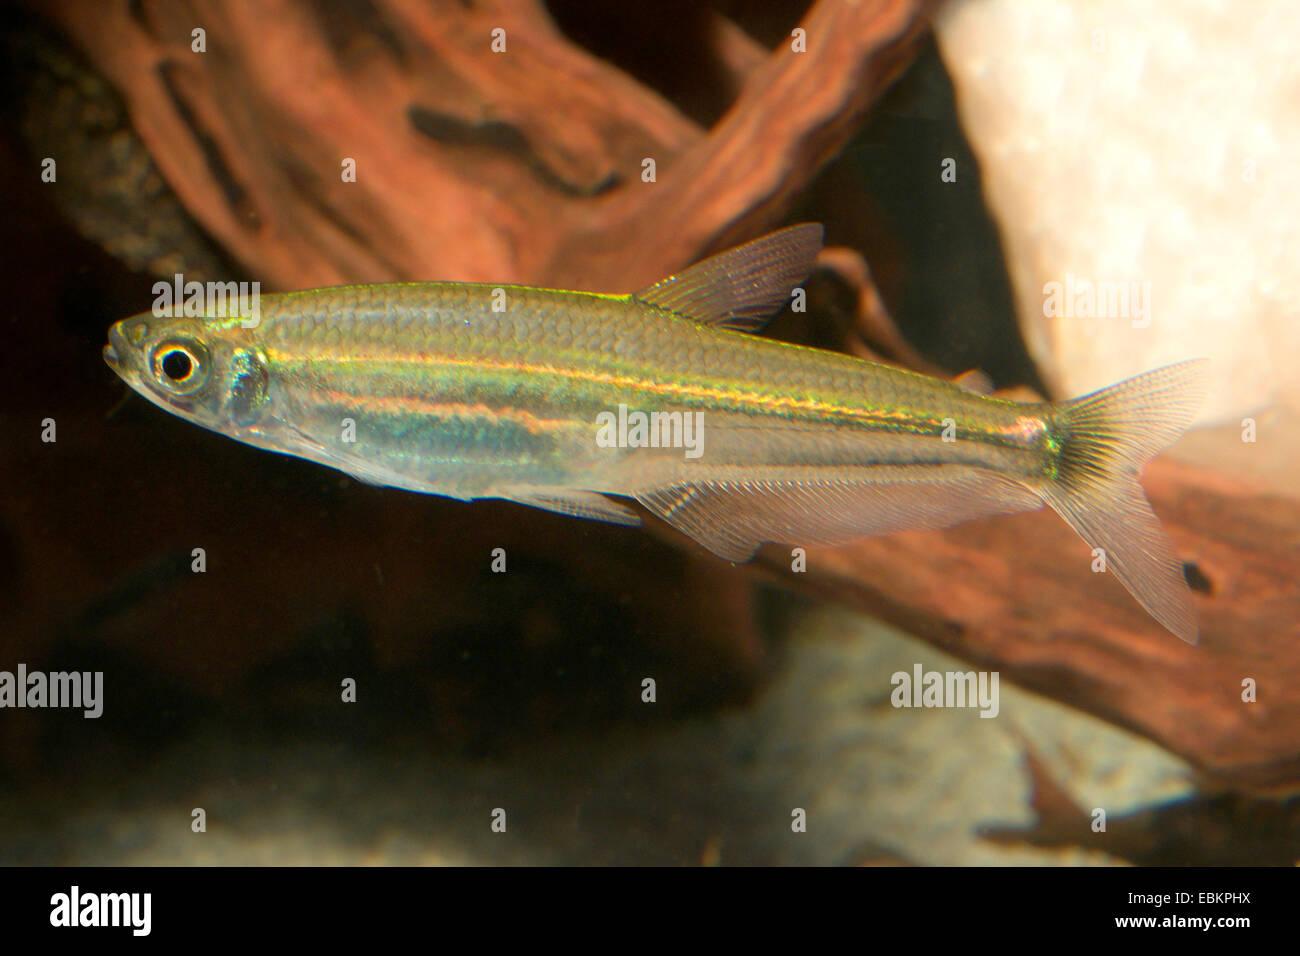 Iguanodectes spilurus mince (Tetra), portrait Photo Stock